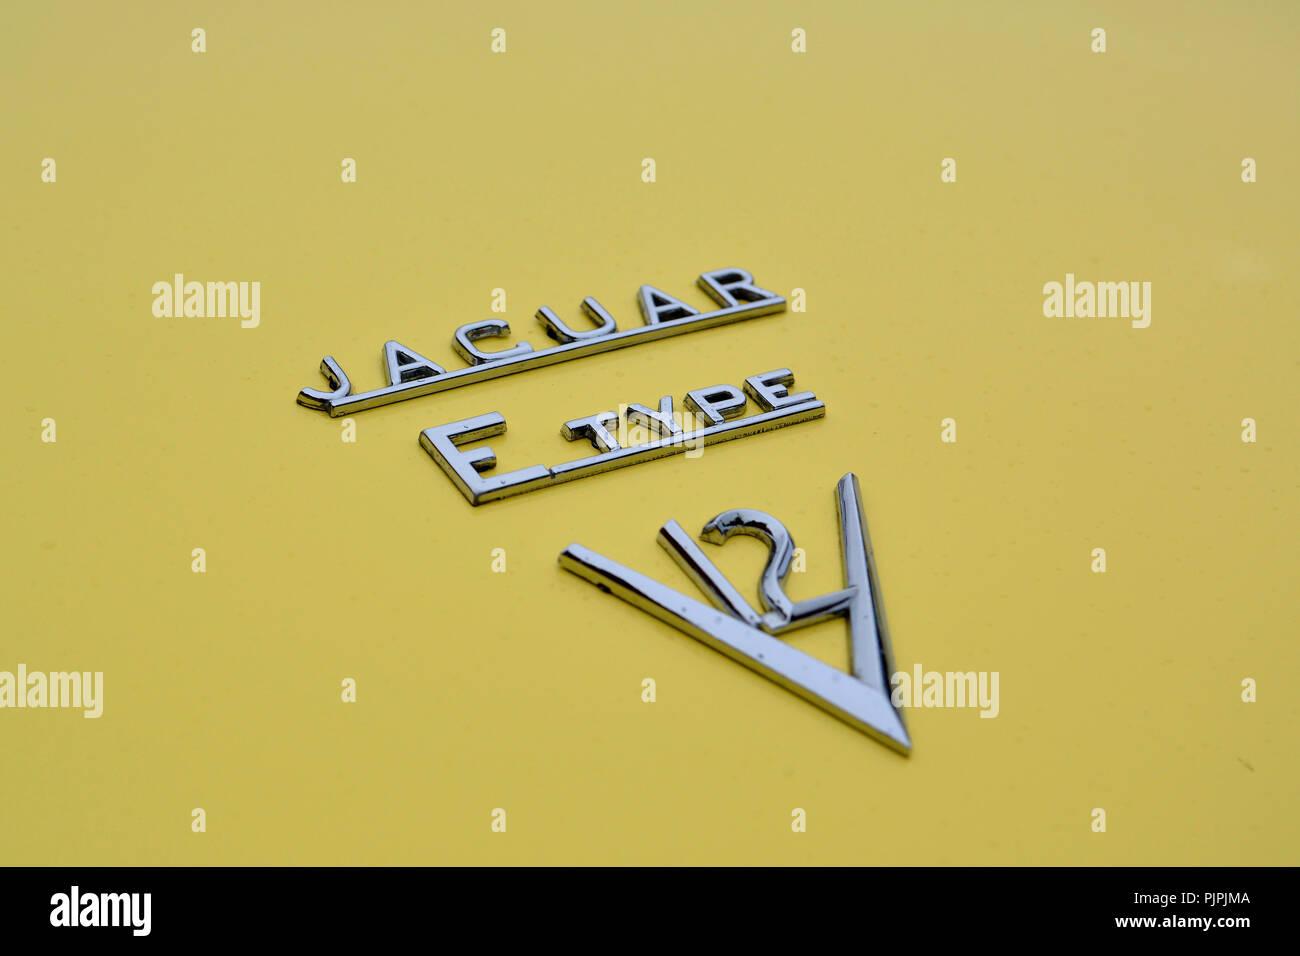 Close up picture of a classic Jaguar E Type car - Stock Image